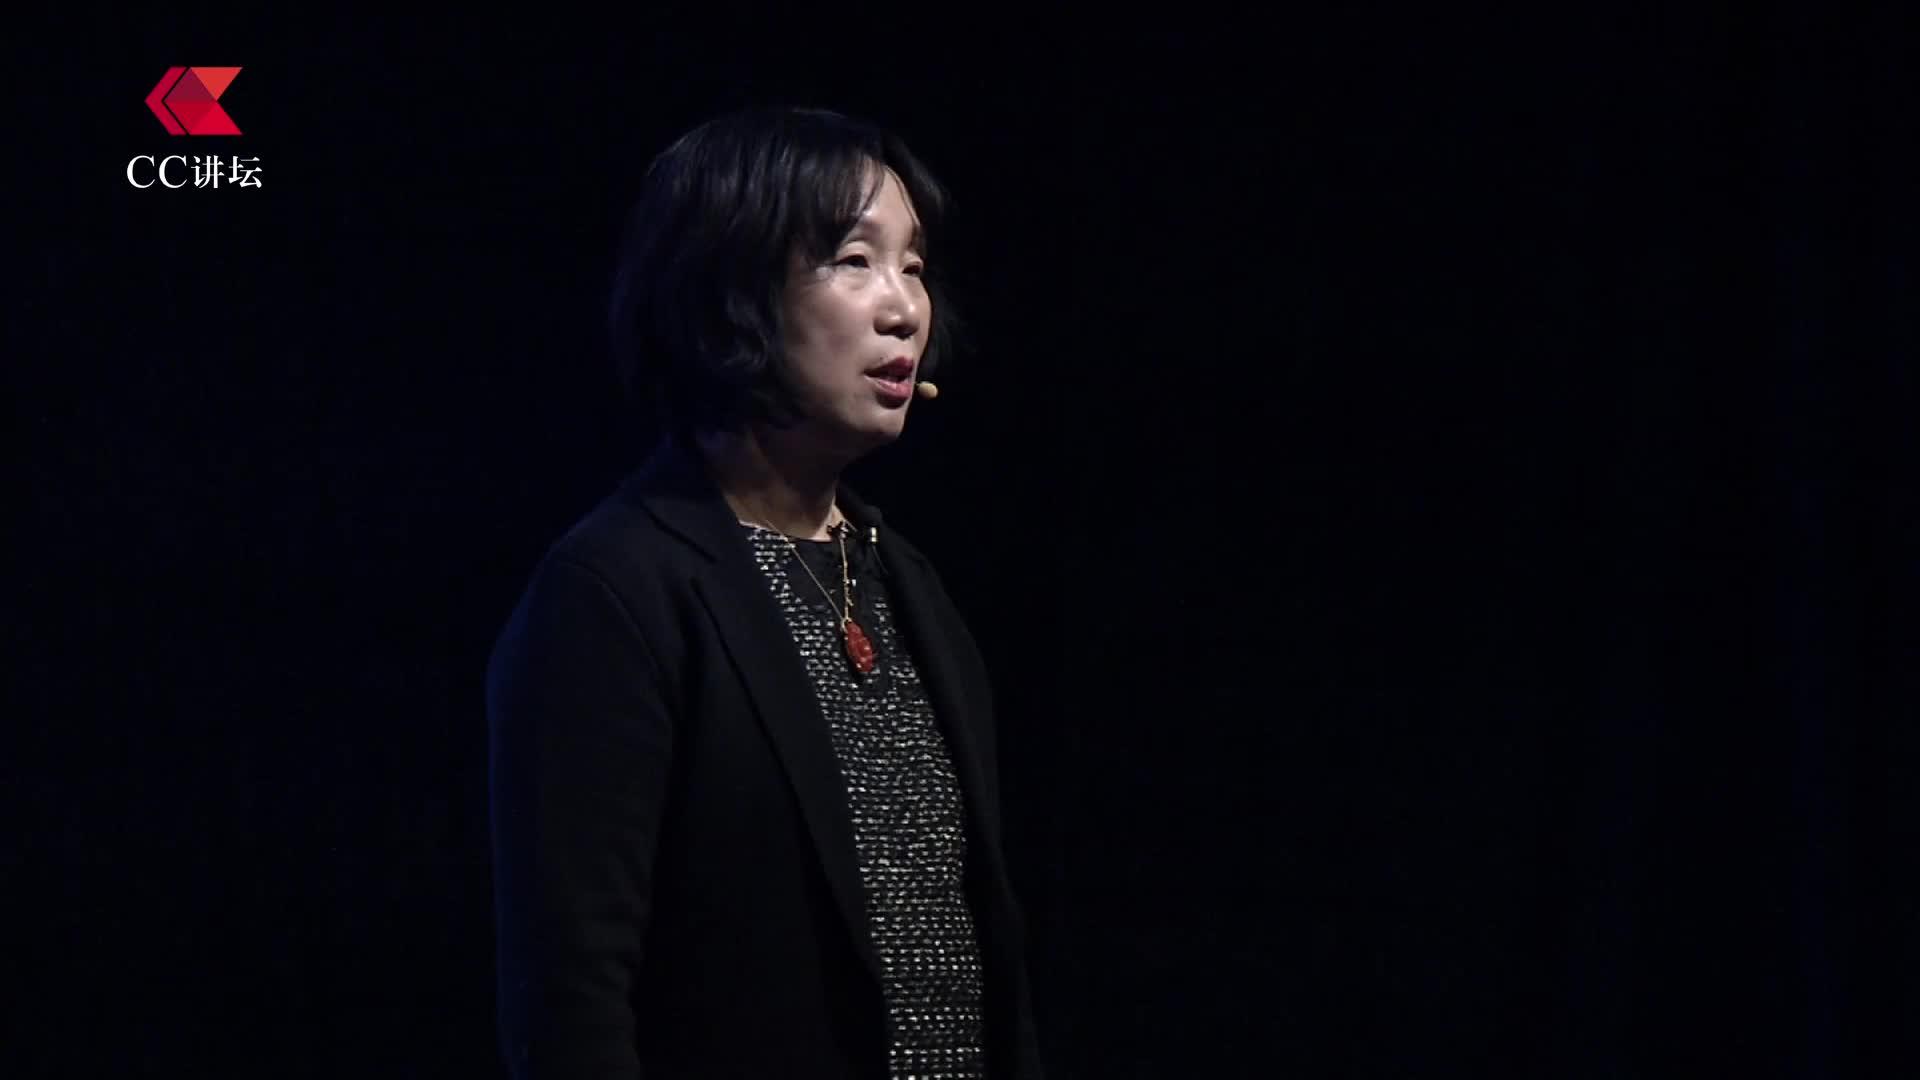 【CC讲坛-公益】刘凤梅:让村医成为真正的医生